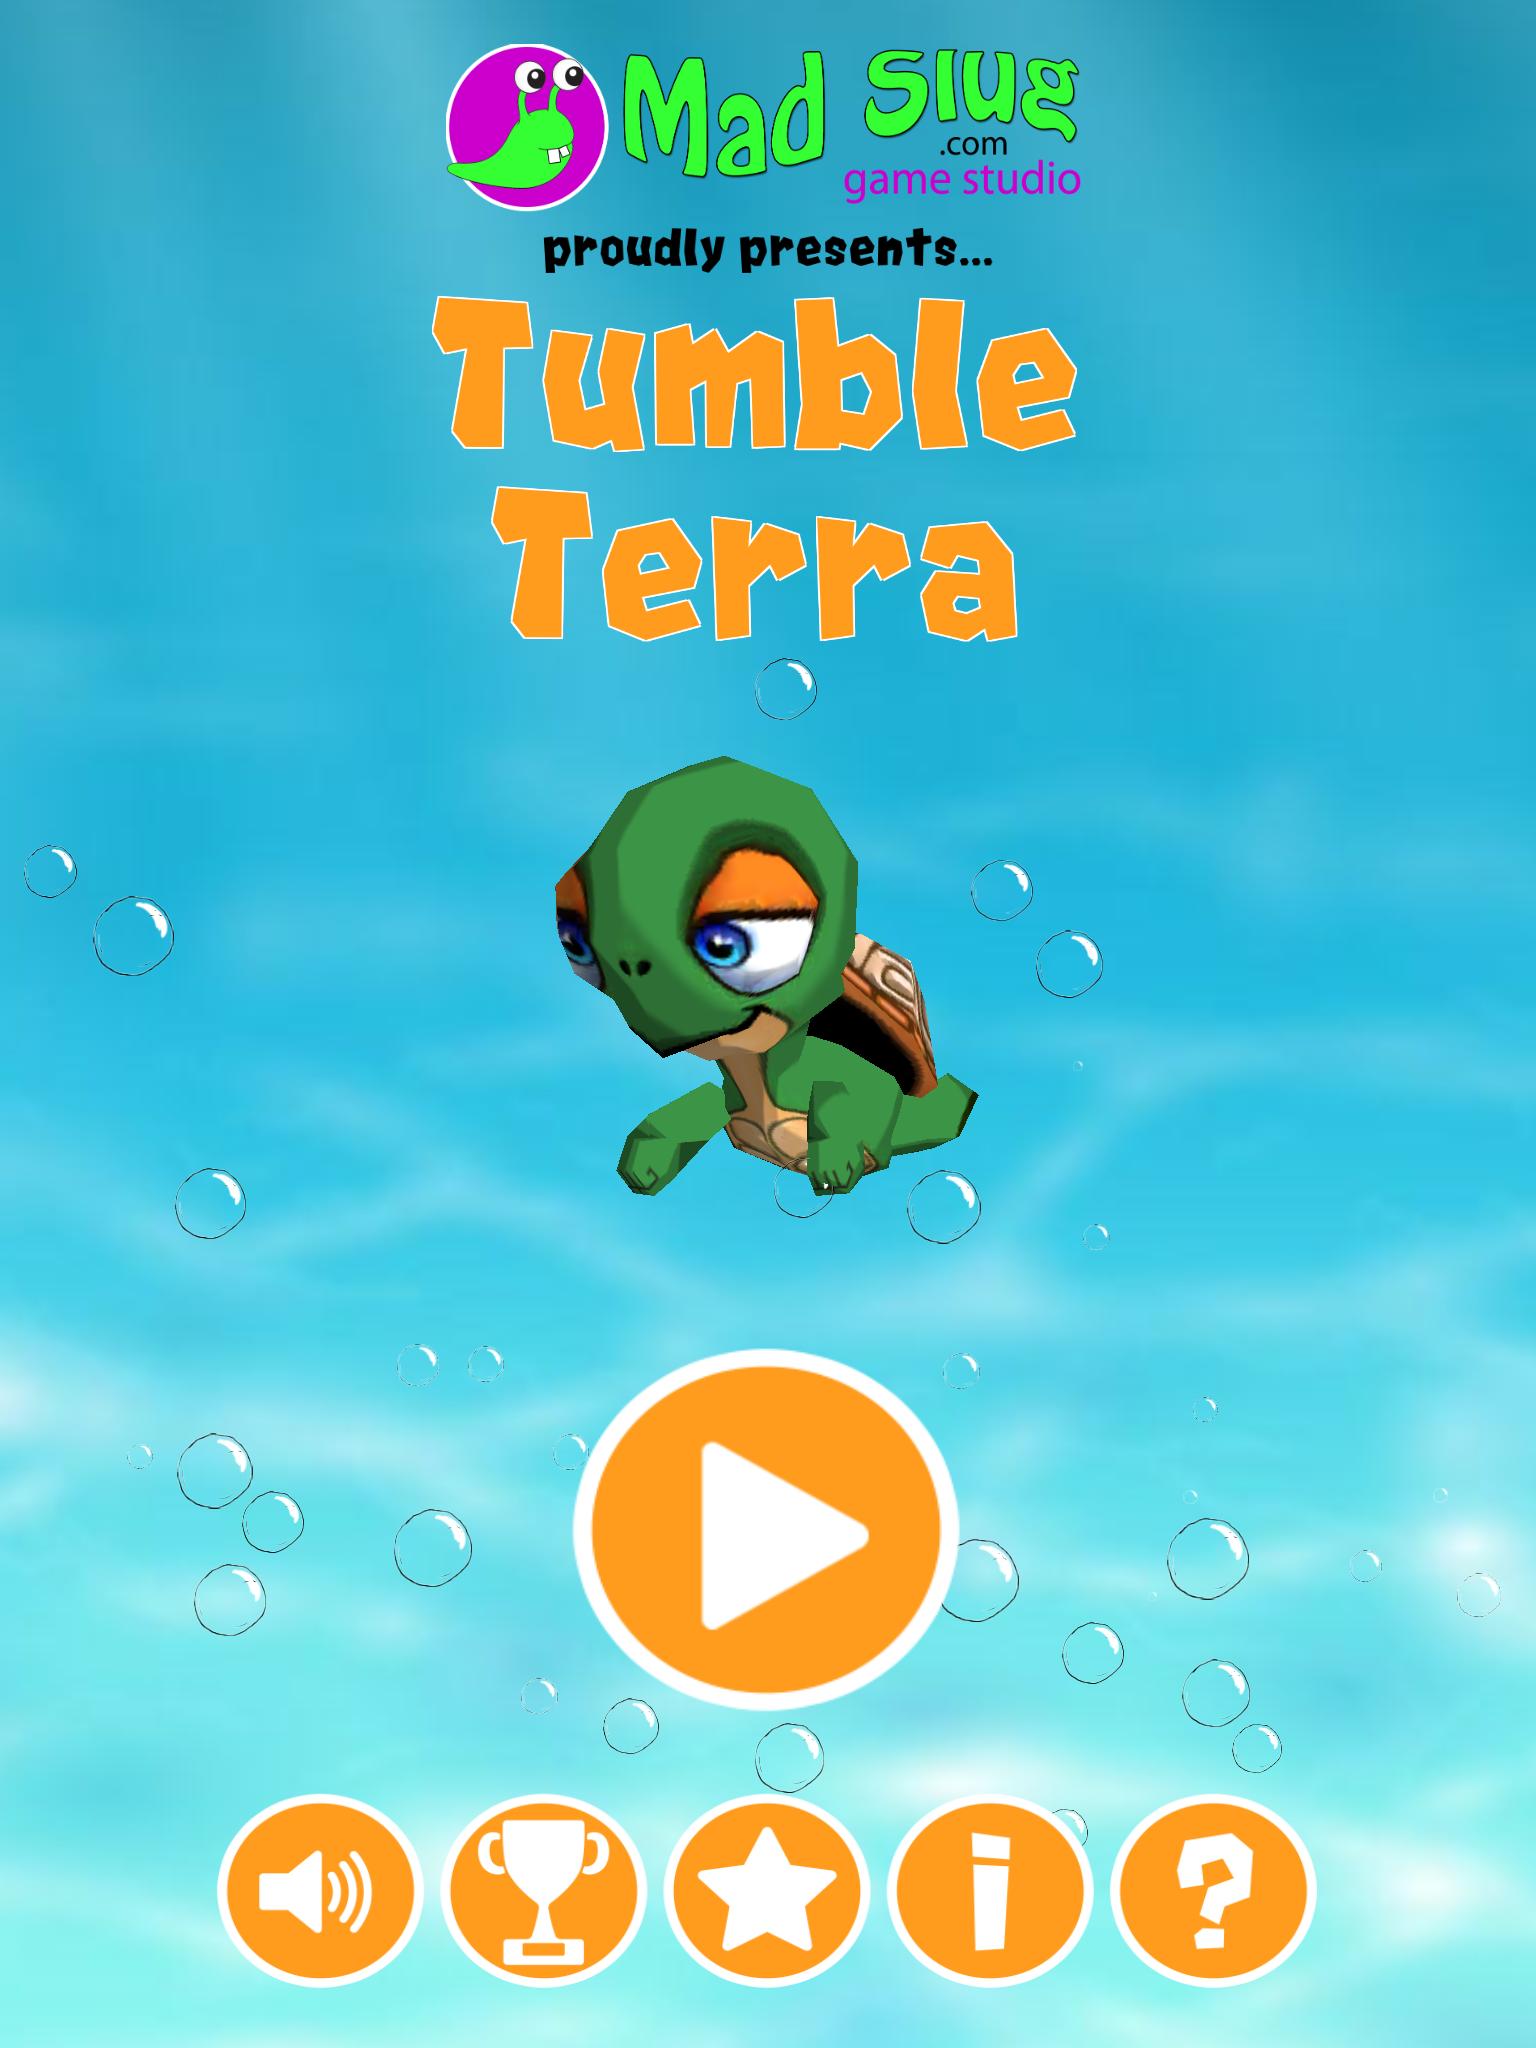 Tumble Terra